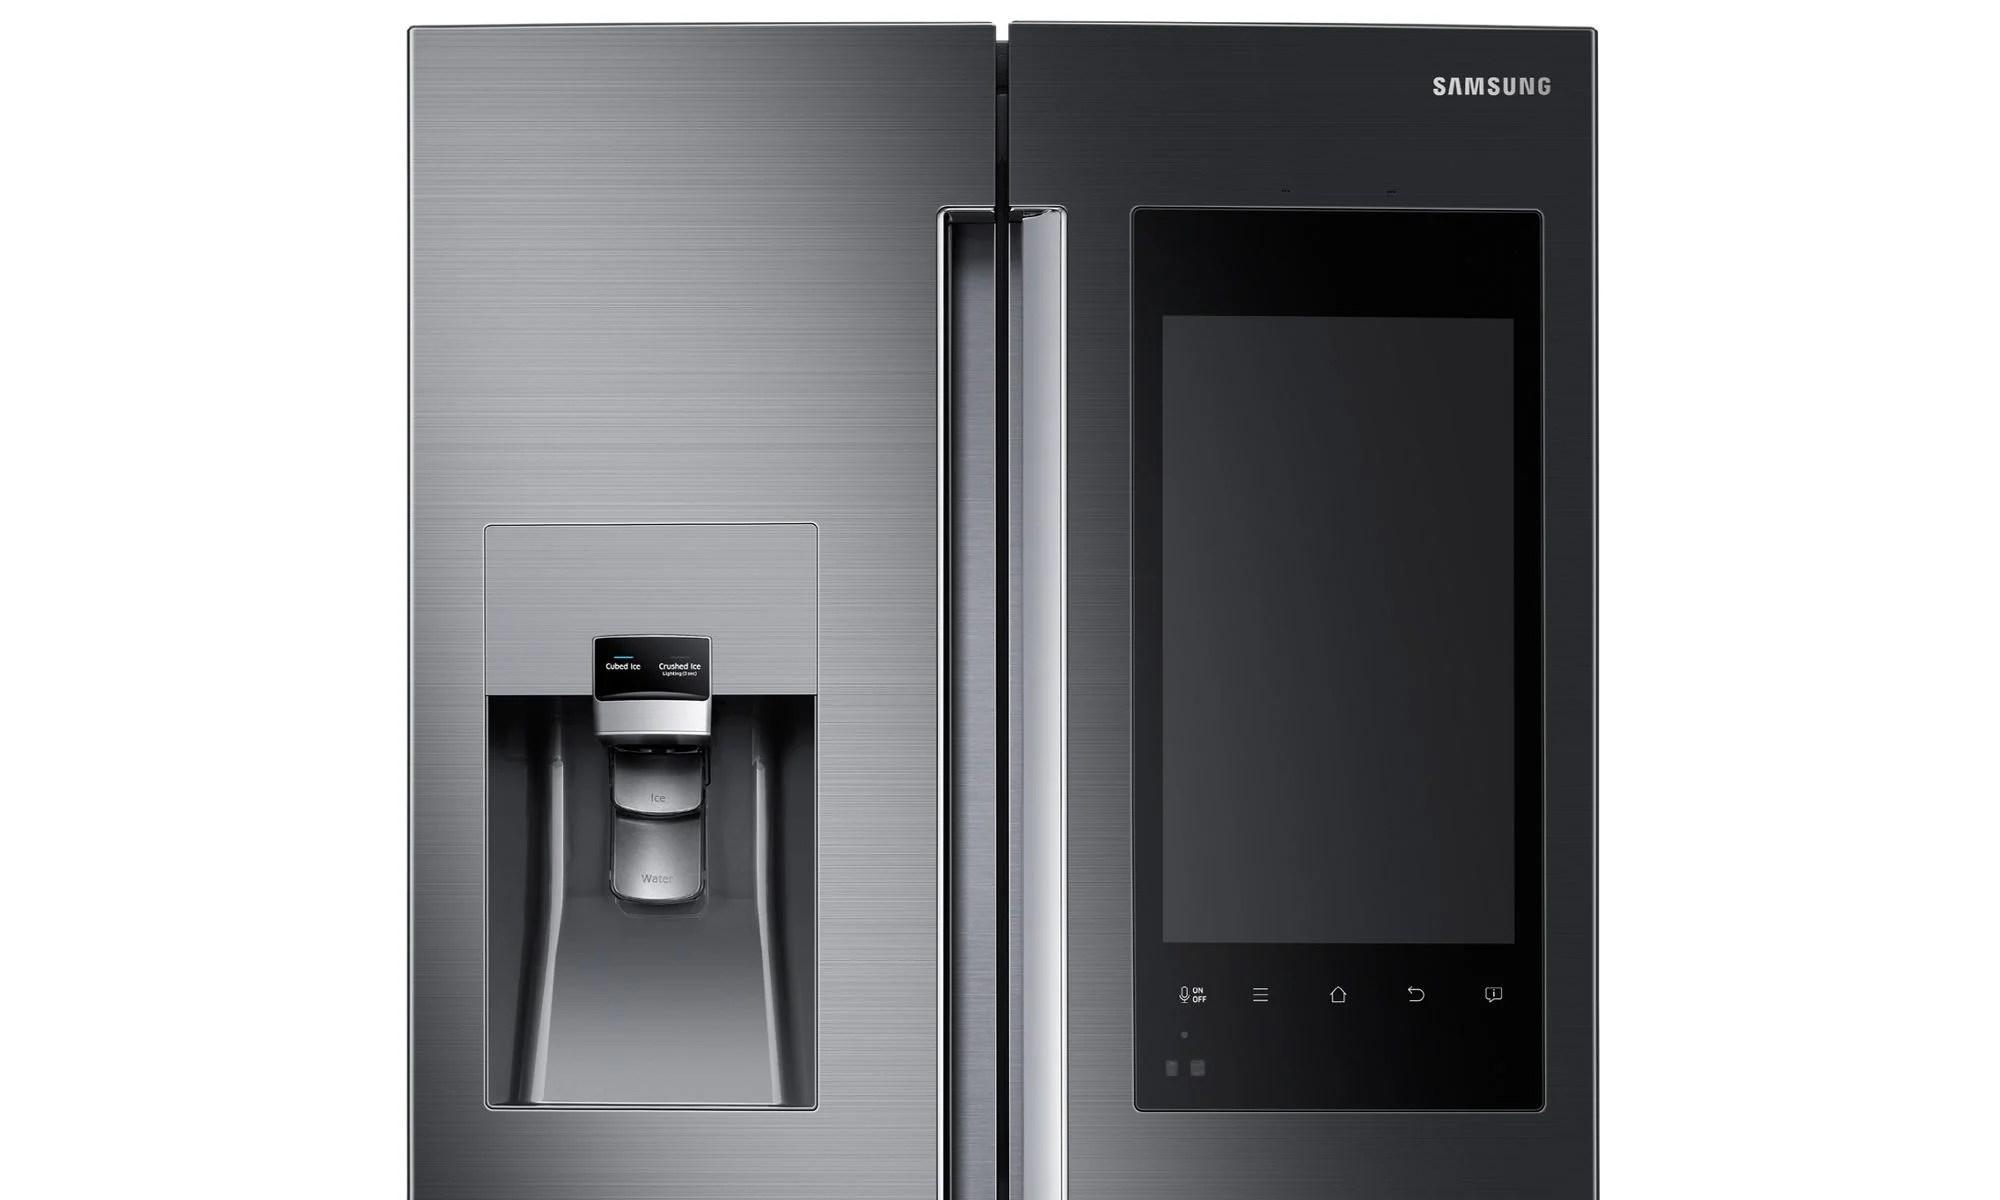 CES 2016 : un frigo sous Android chez Samsung ?